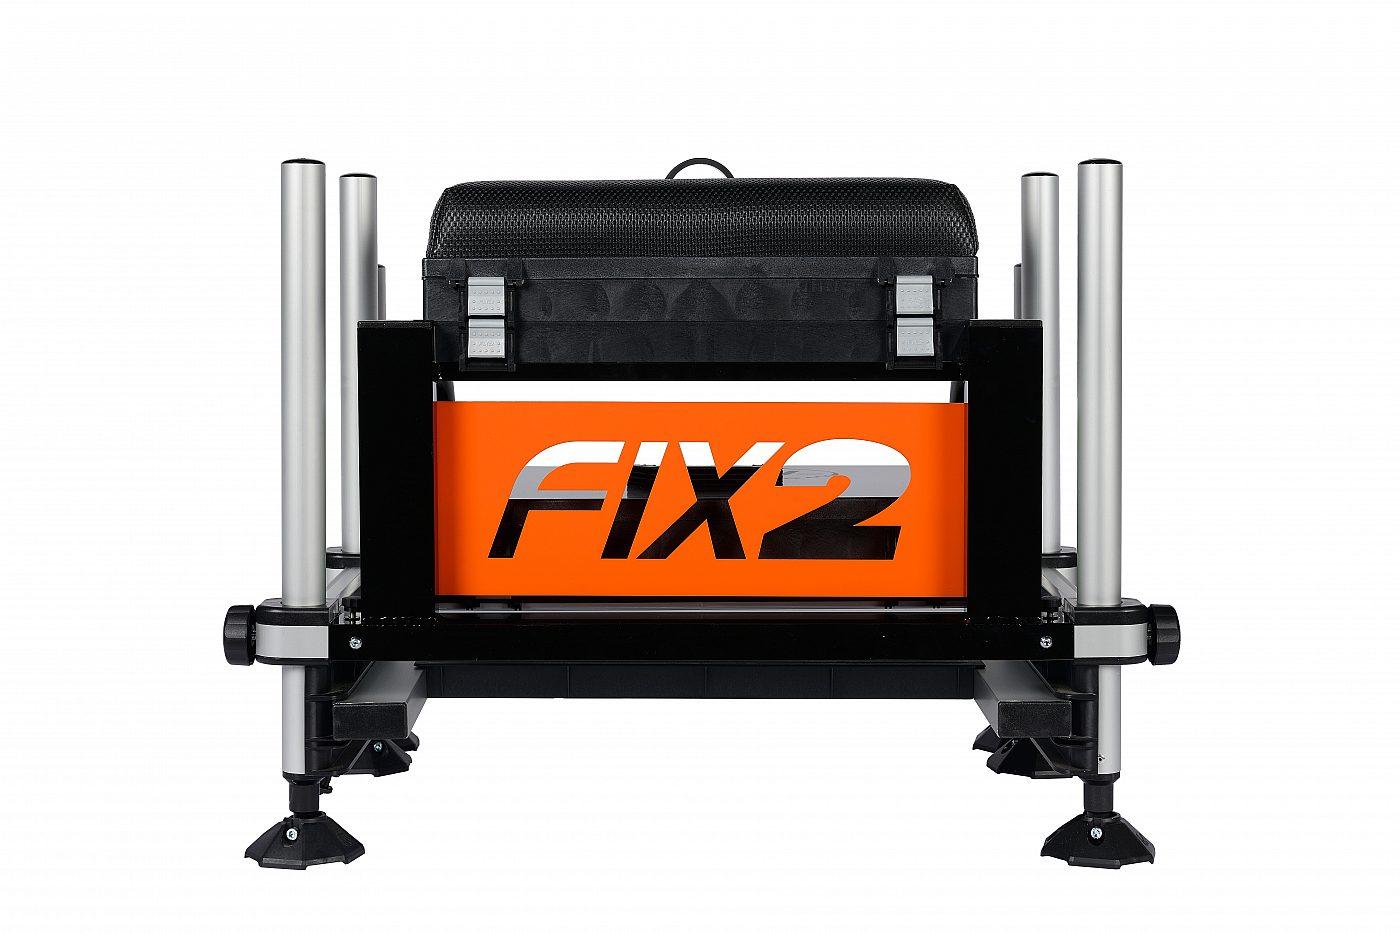 FCSX4 36 BLAORA back